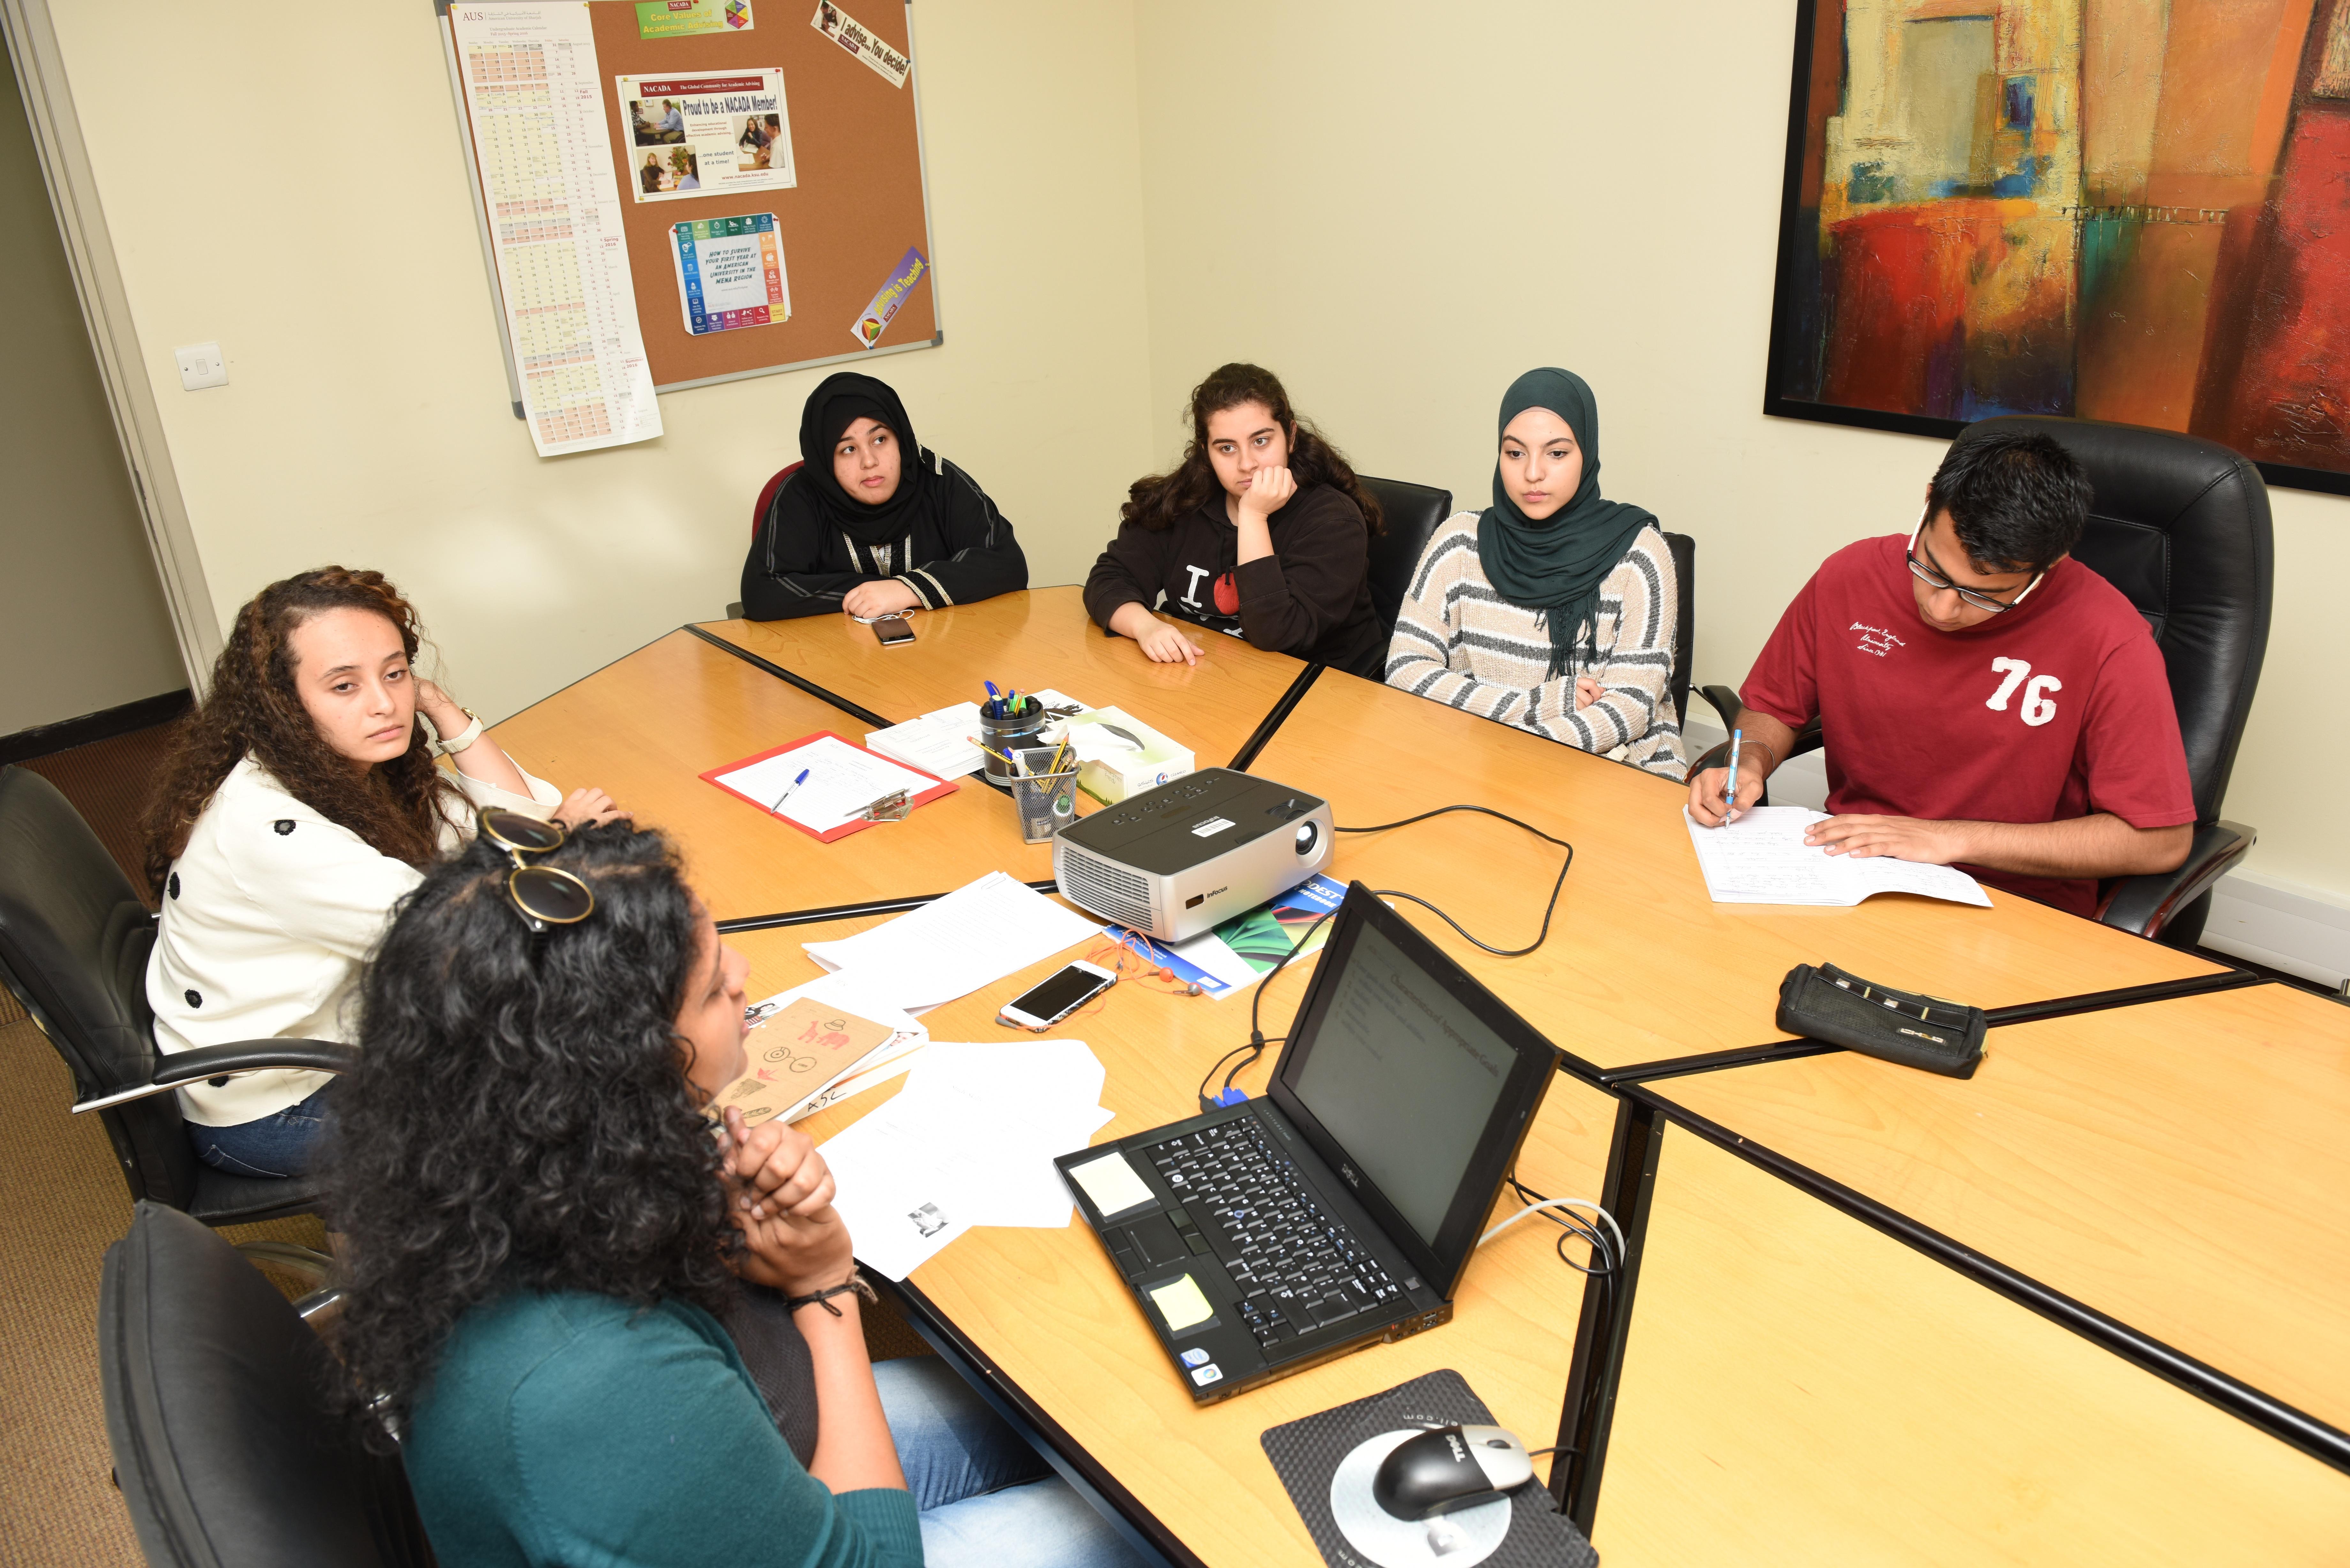 American_University_of_Sharjah_22-1.jpg